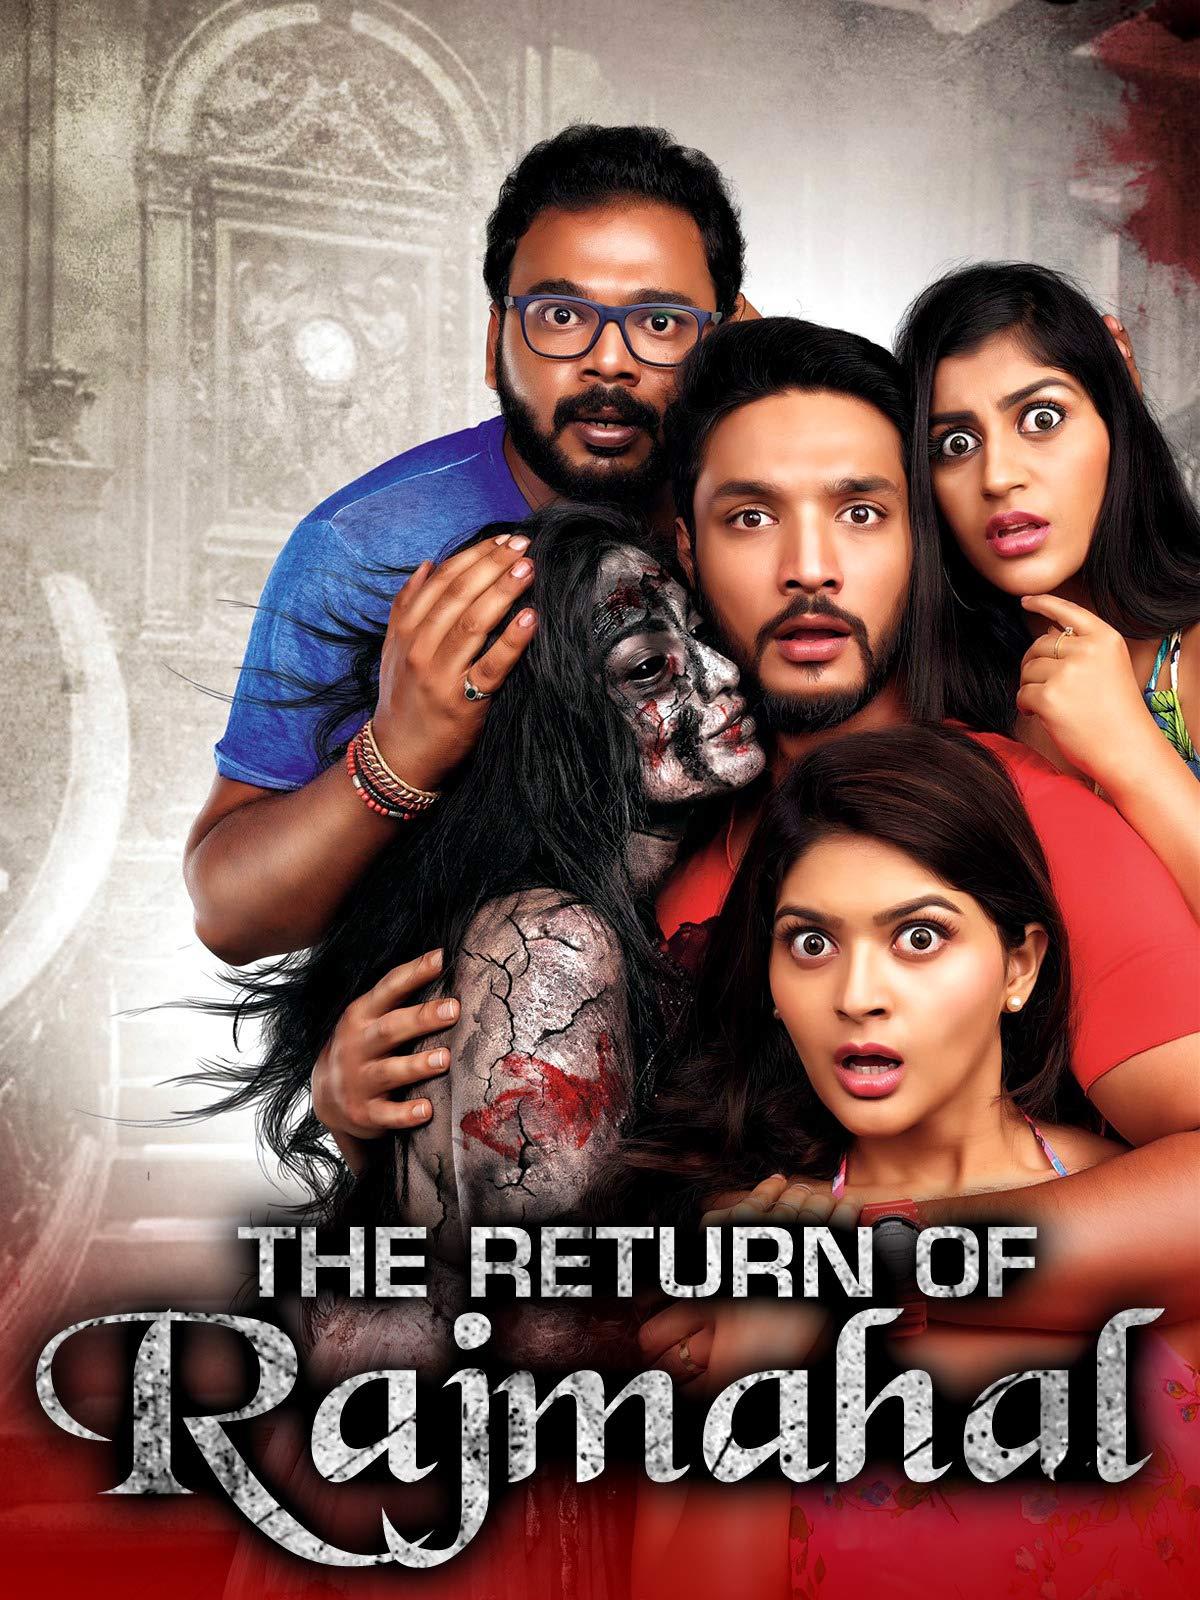 The Return Of Rajmahal (IAMK) 2021 Hindi Dubbed ORG 720p HDRip 850MB Download